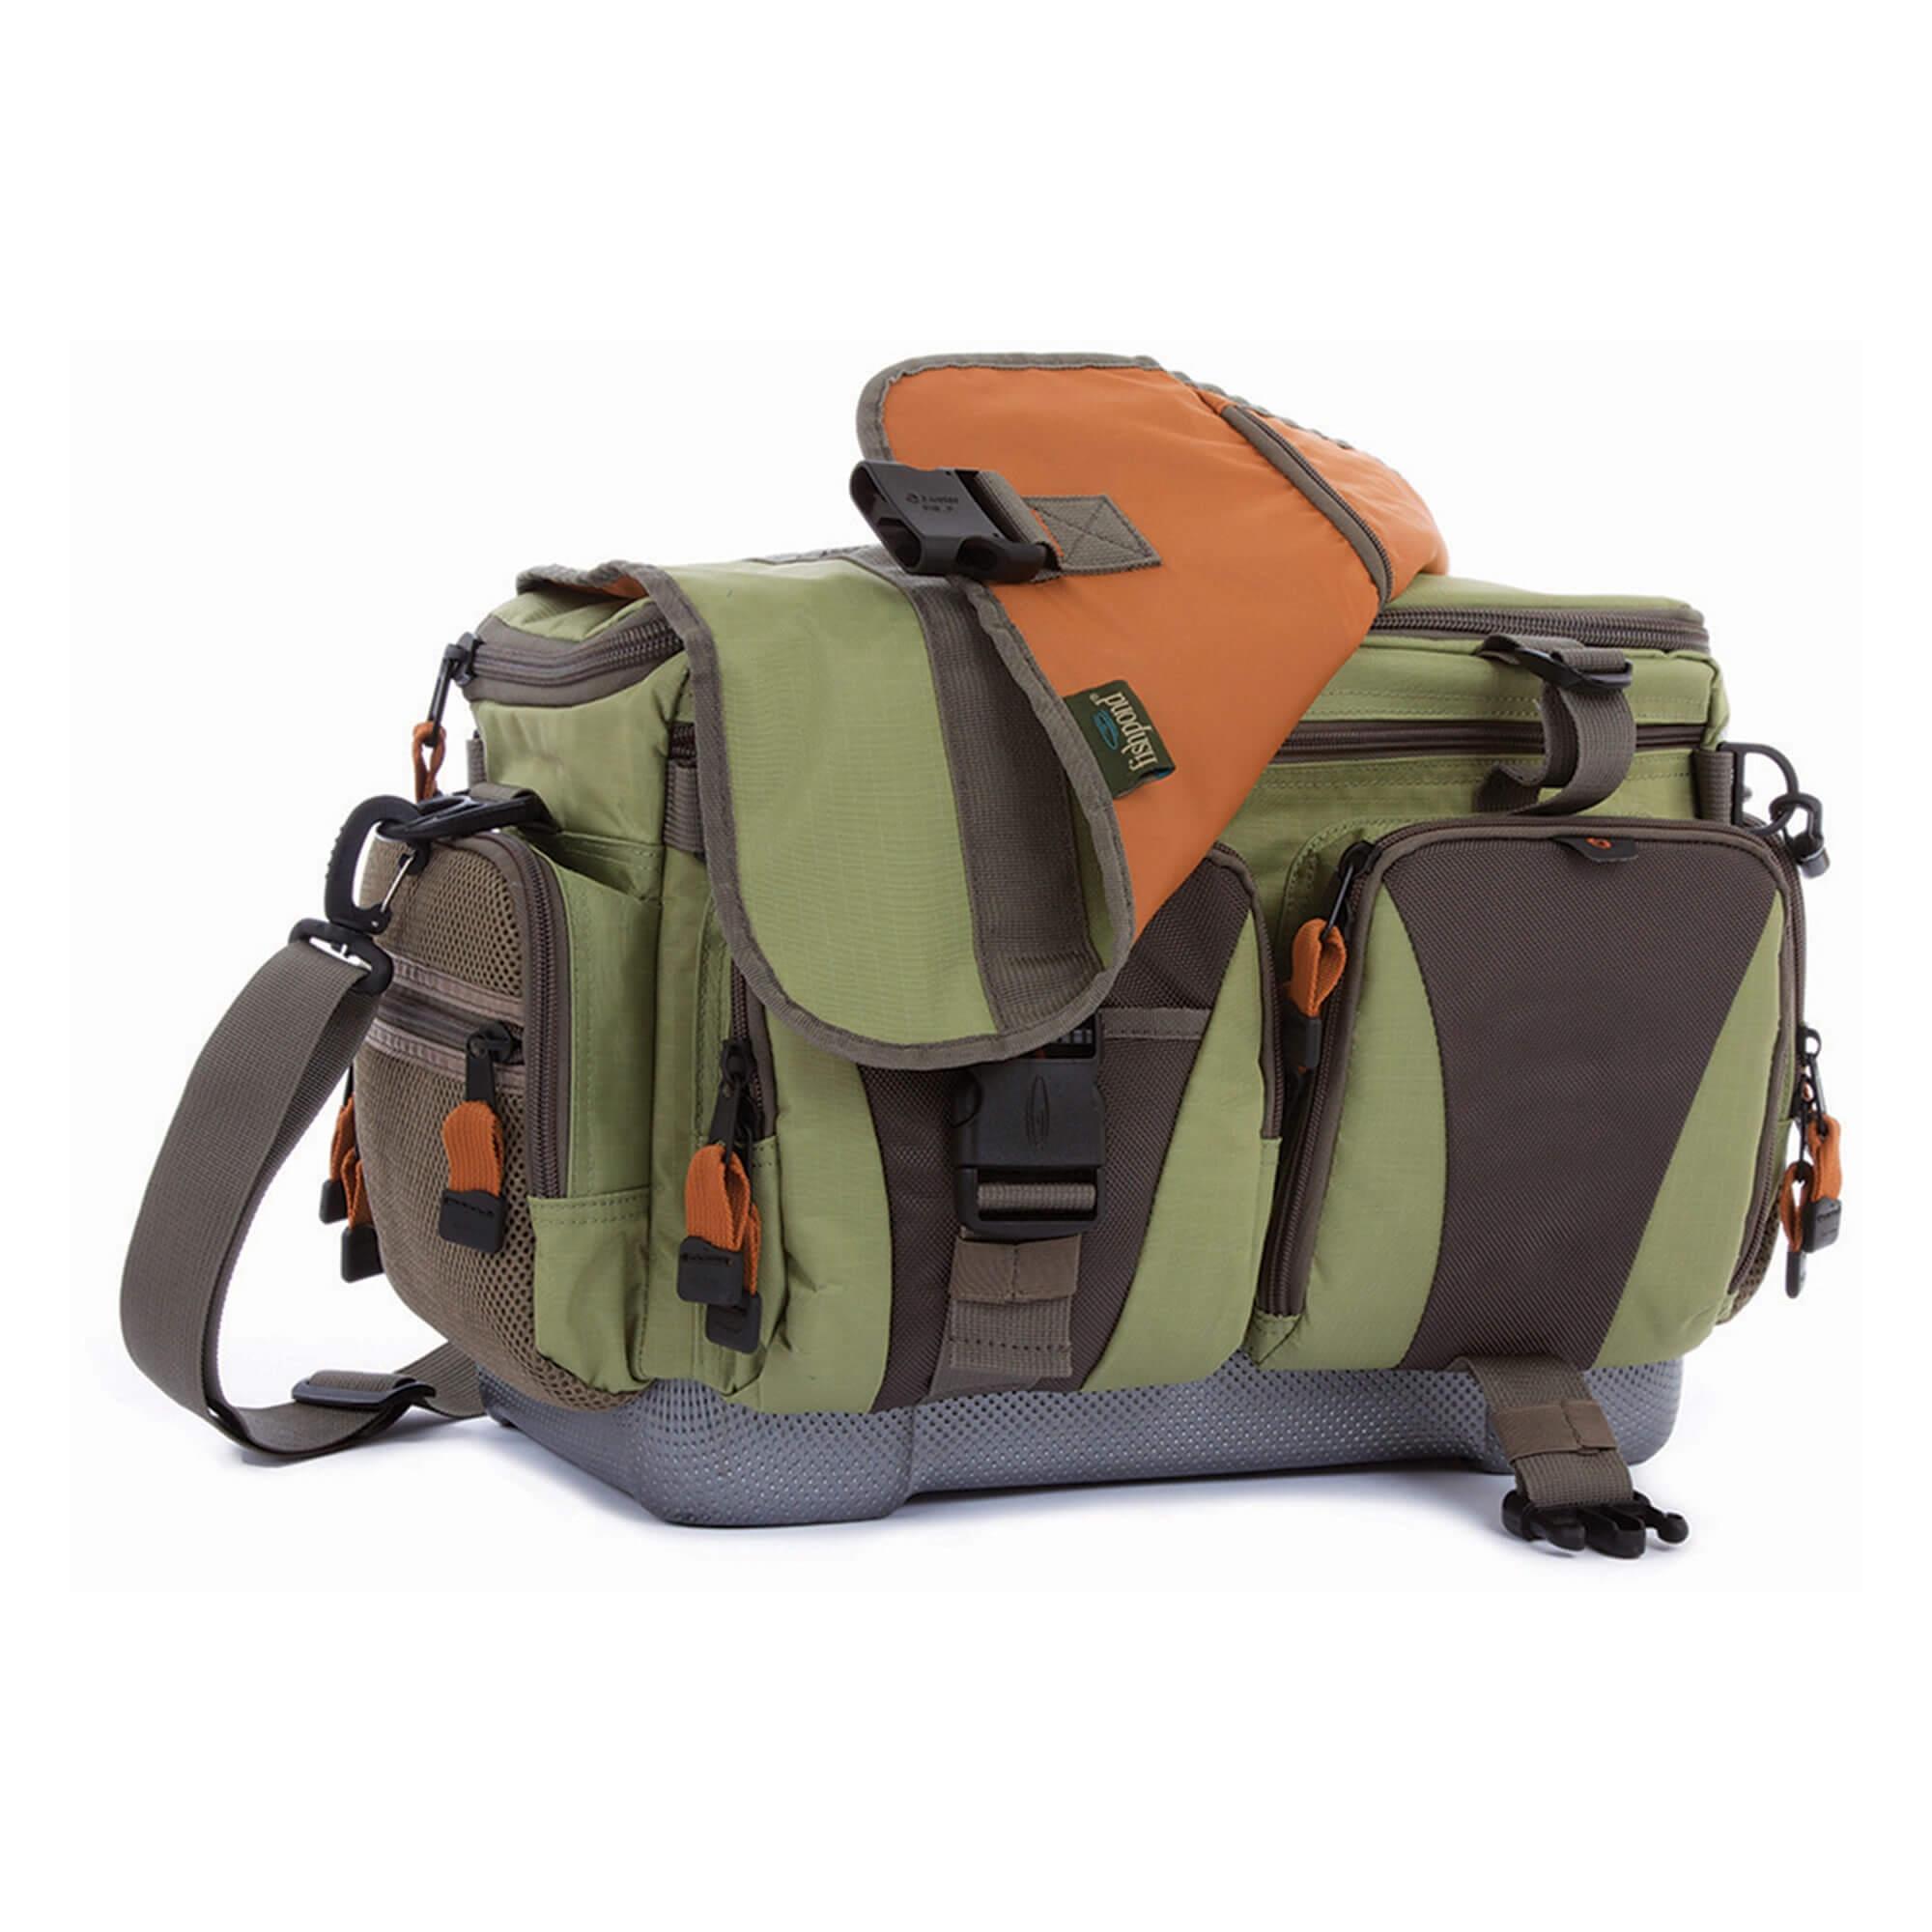 Cloudburst Gear Bag